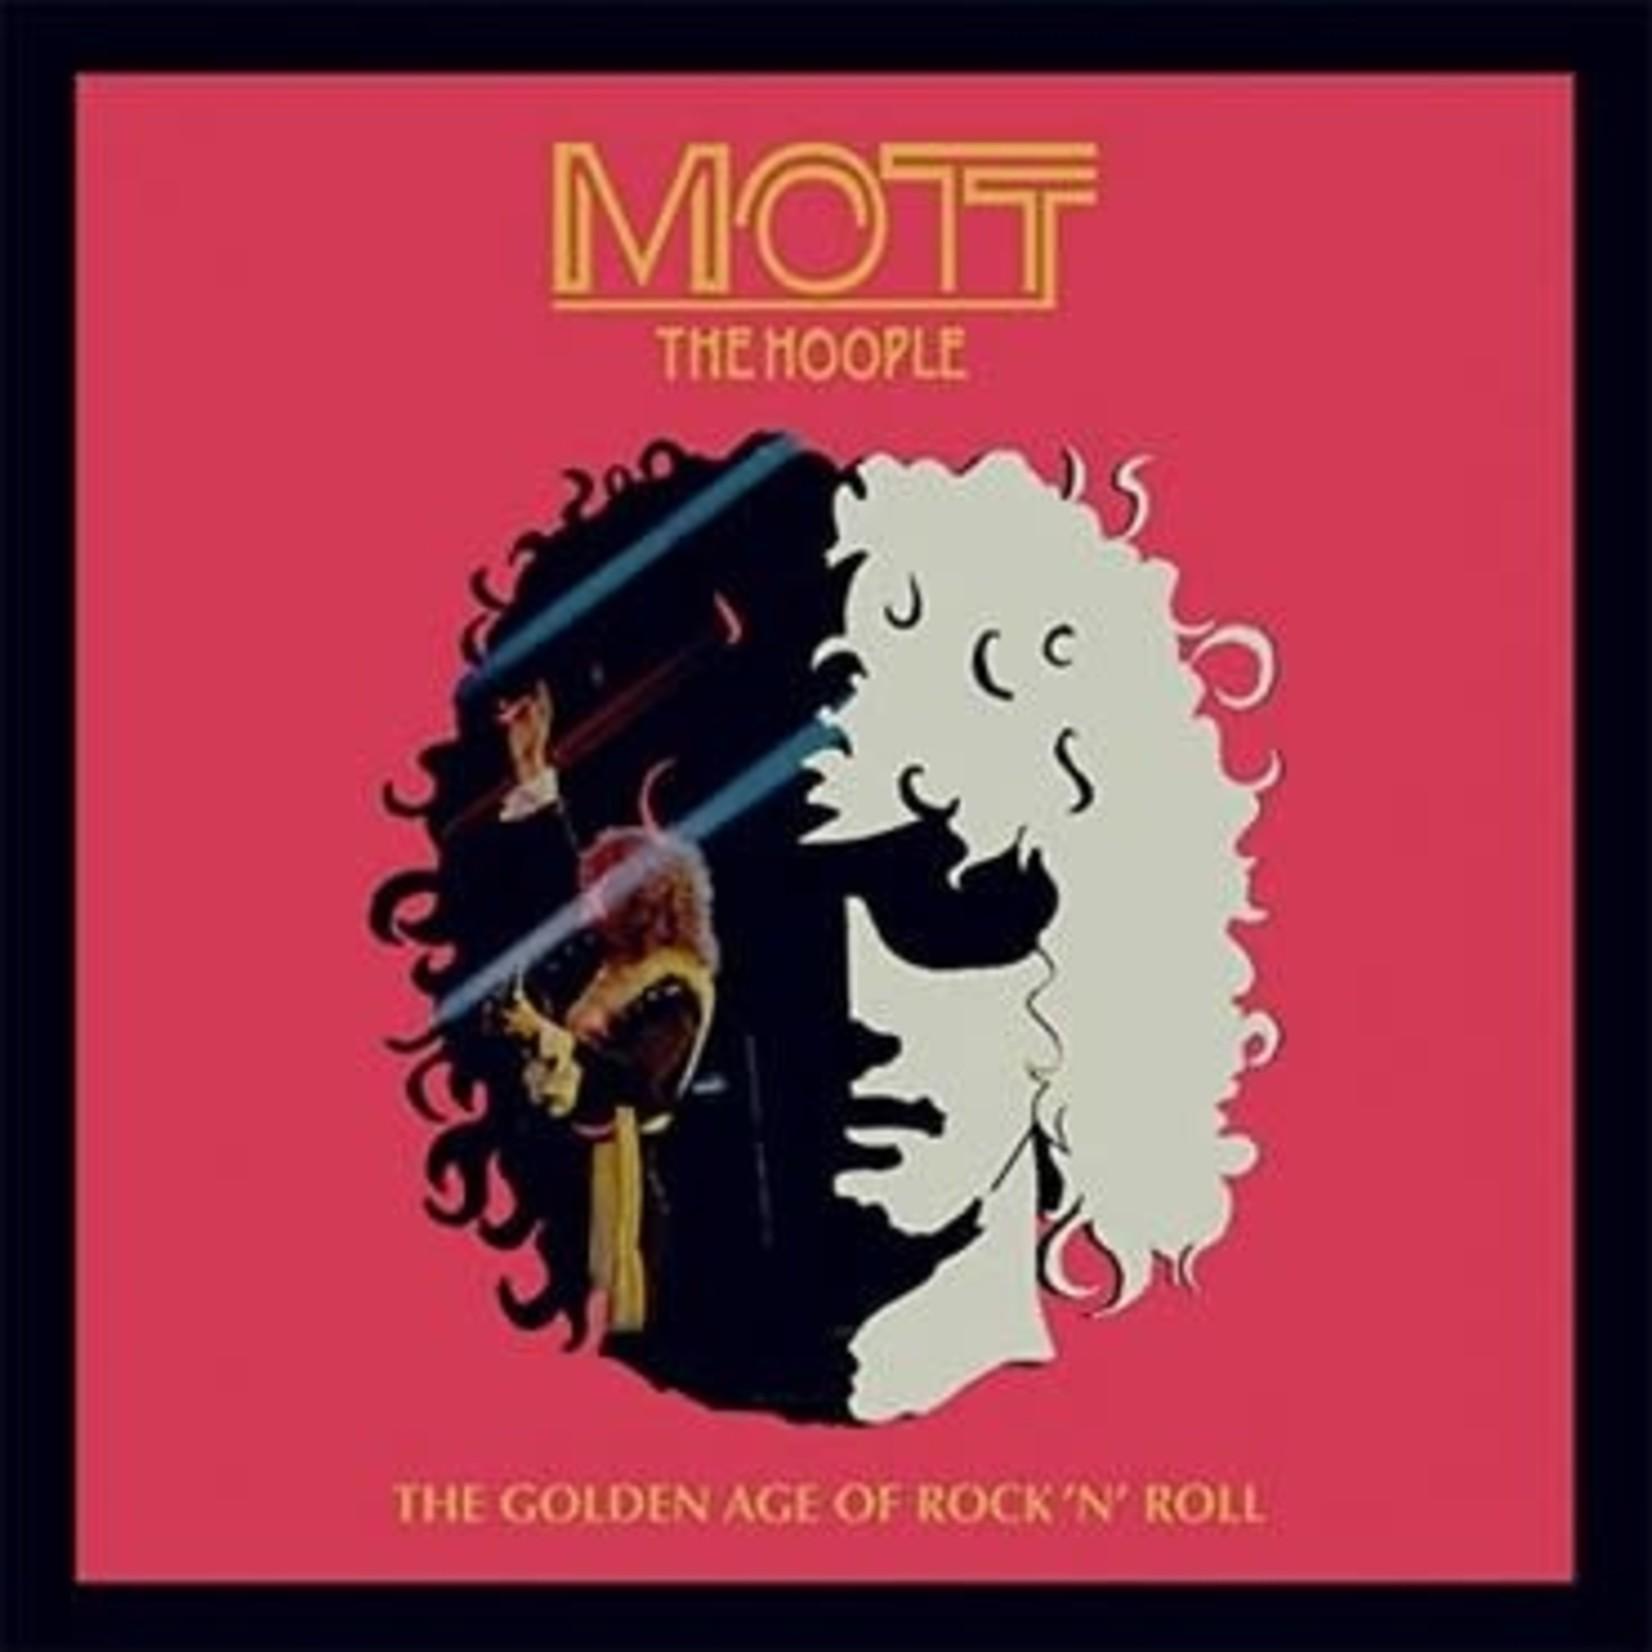 Vinyl Mott The Hoople - The Golden Age Of Rock 'N' Roll